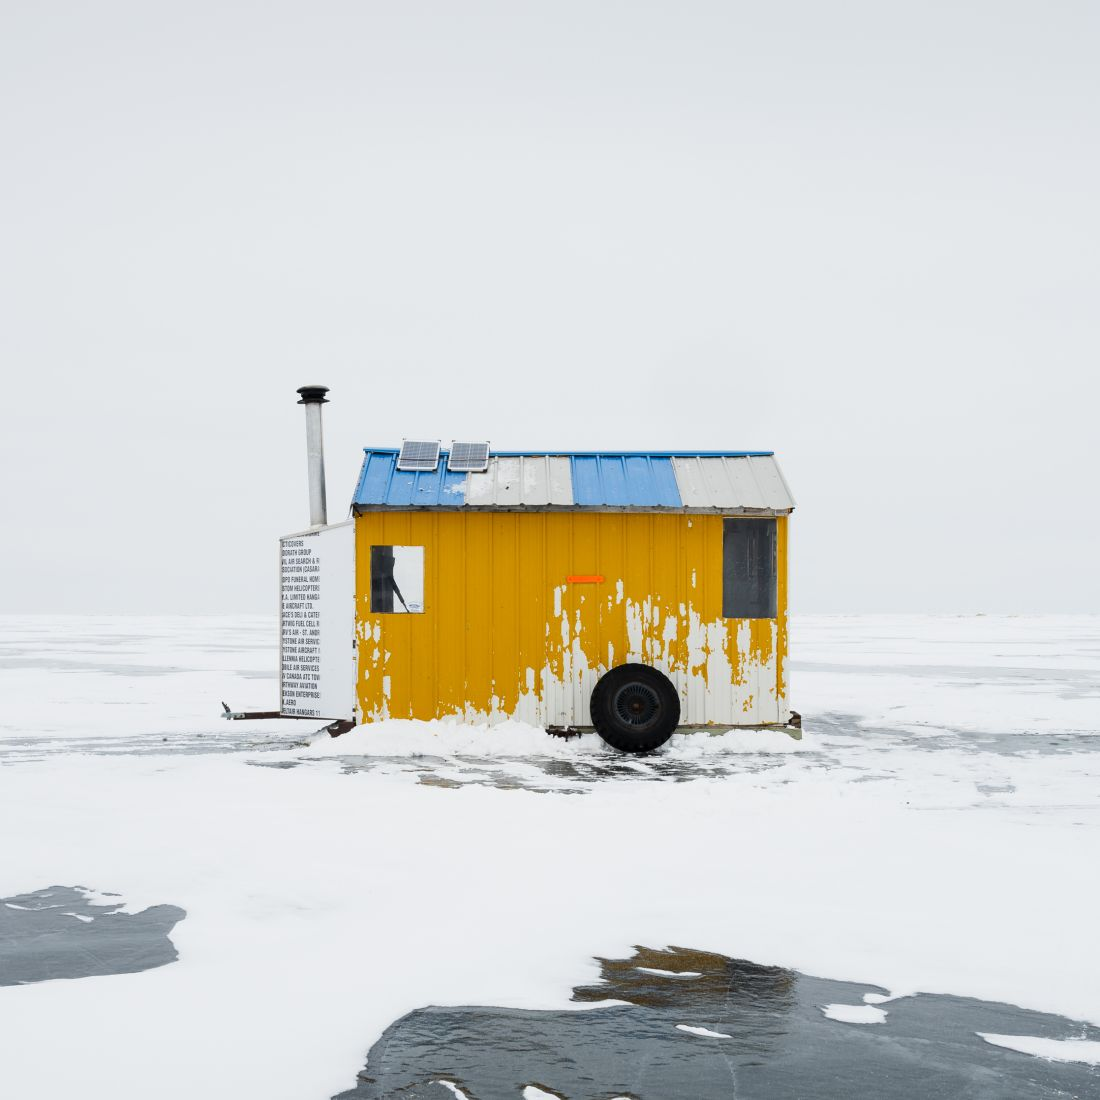 Ice Fishing Huts, Lake Winnipeg © Sandra Herber, Canada, Finalist, Professional, Architecture, 2020 Sony World Photography Awards